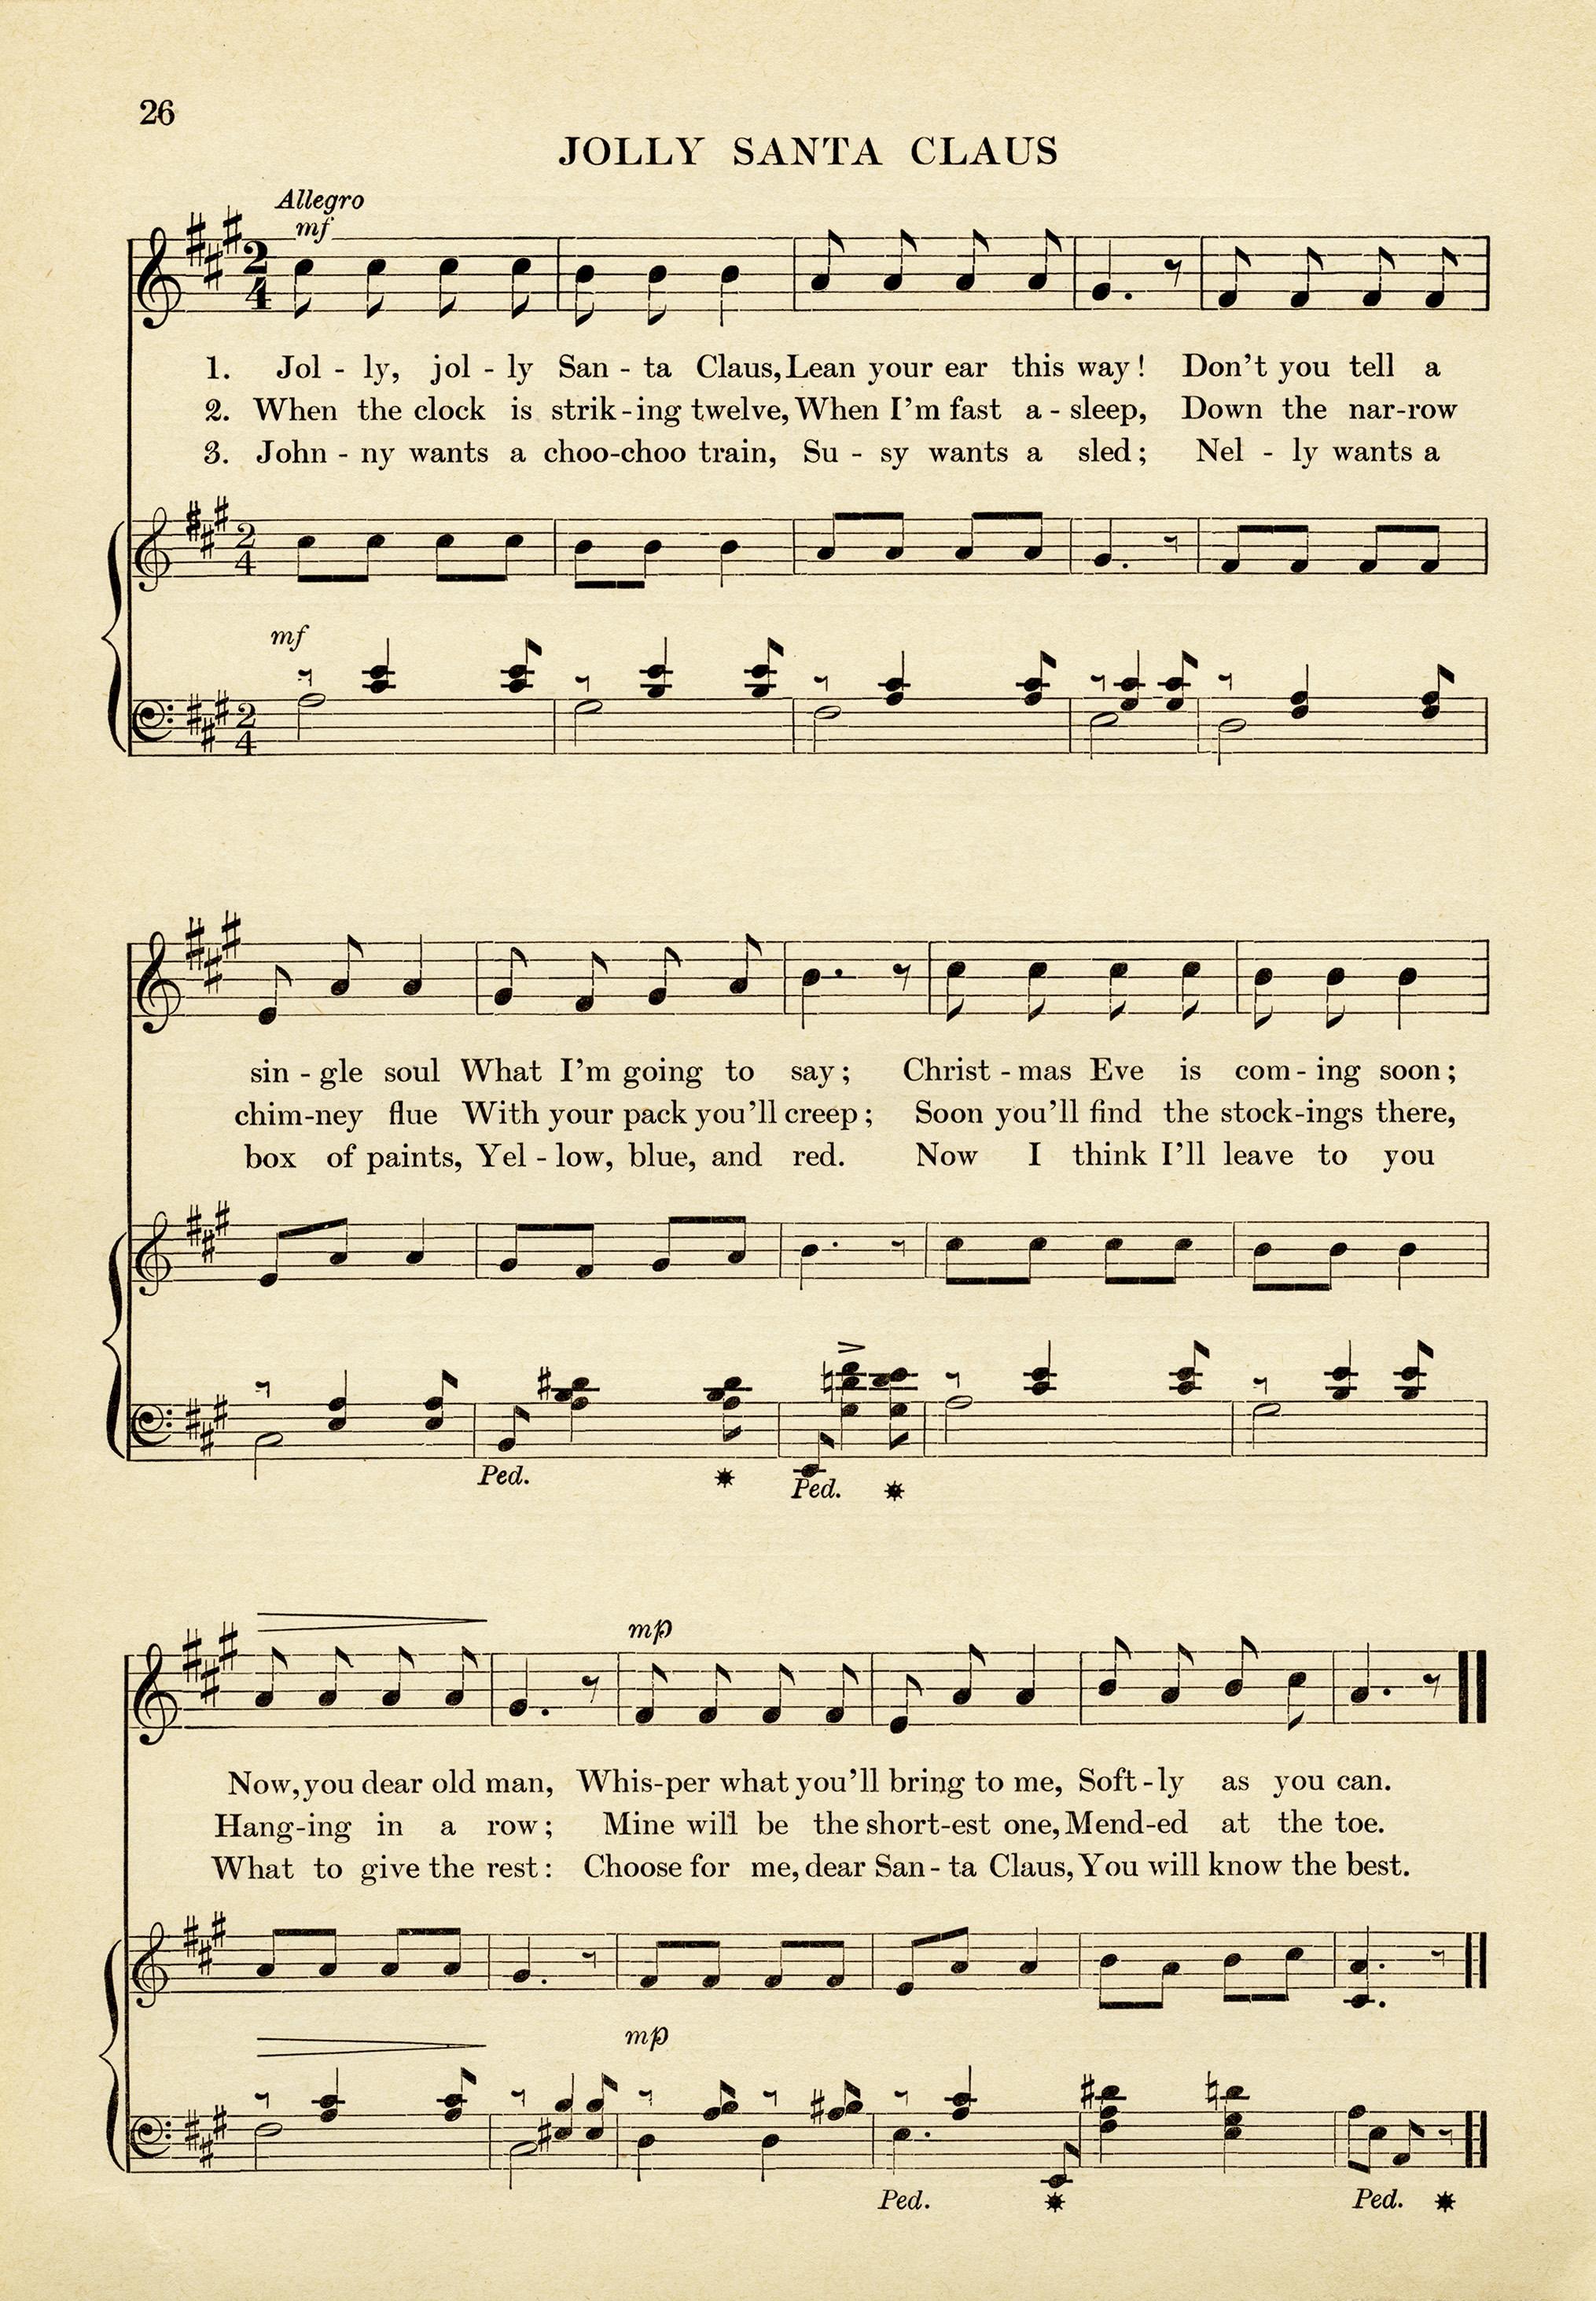 Jolly Santa Claus Vintage Sheet Music - Old Design Shop Blog